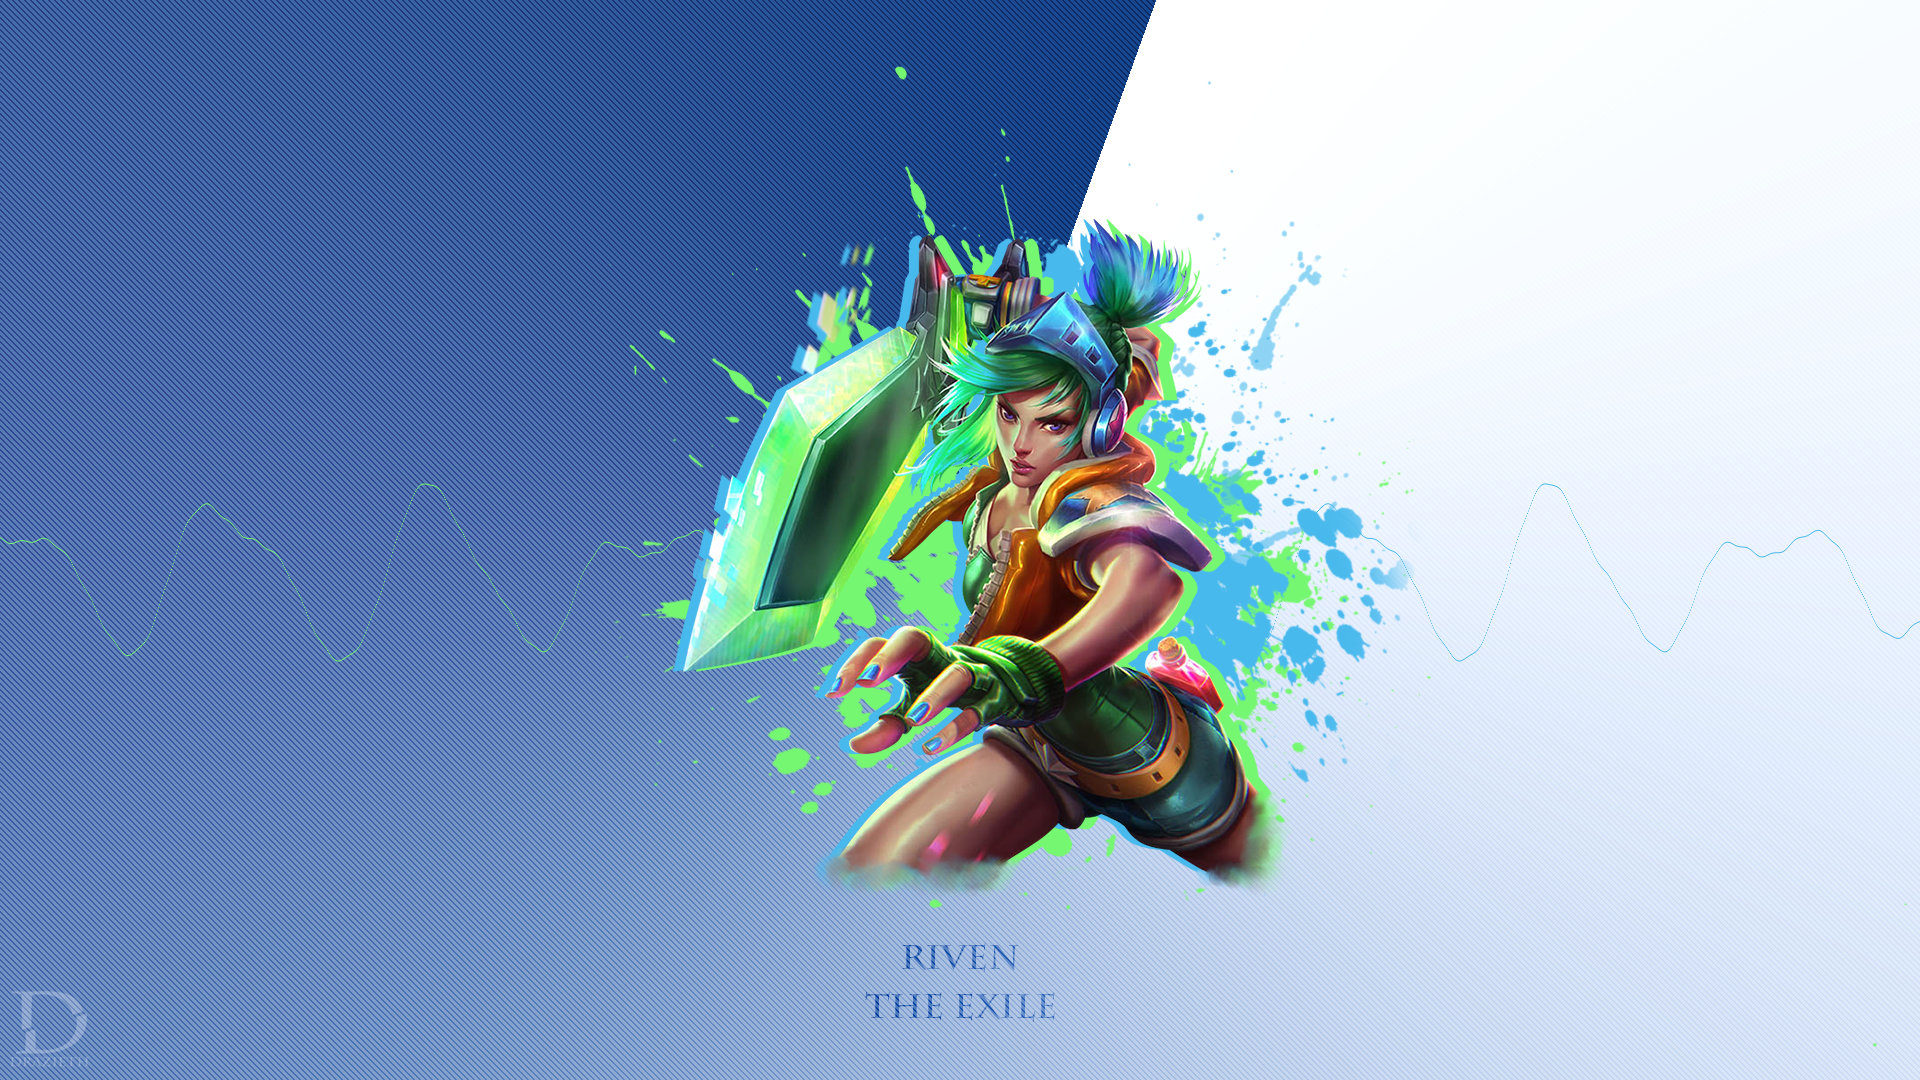 Arcade Riven League Of Legends Wallpaper By Drazieth On Deviantart